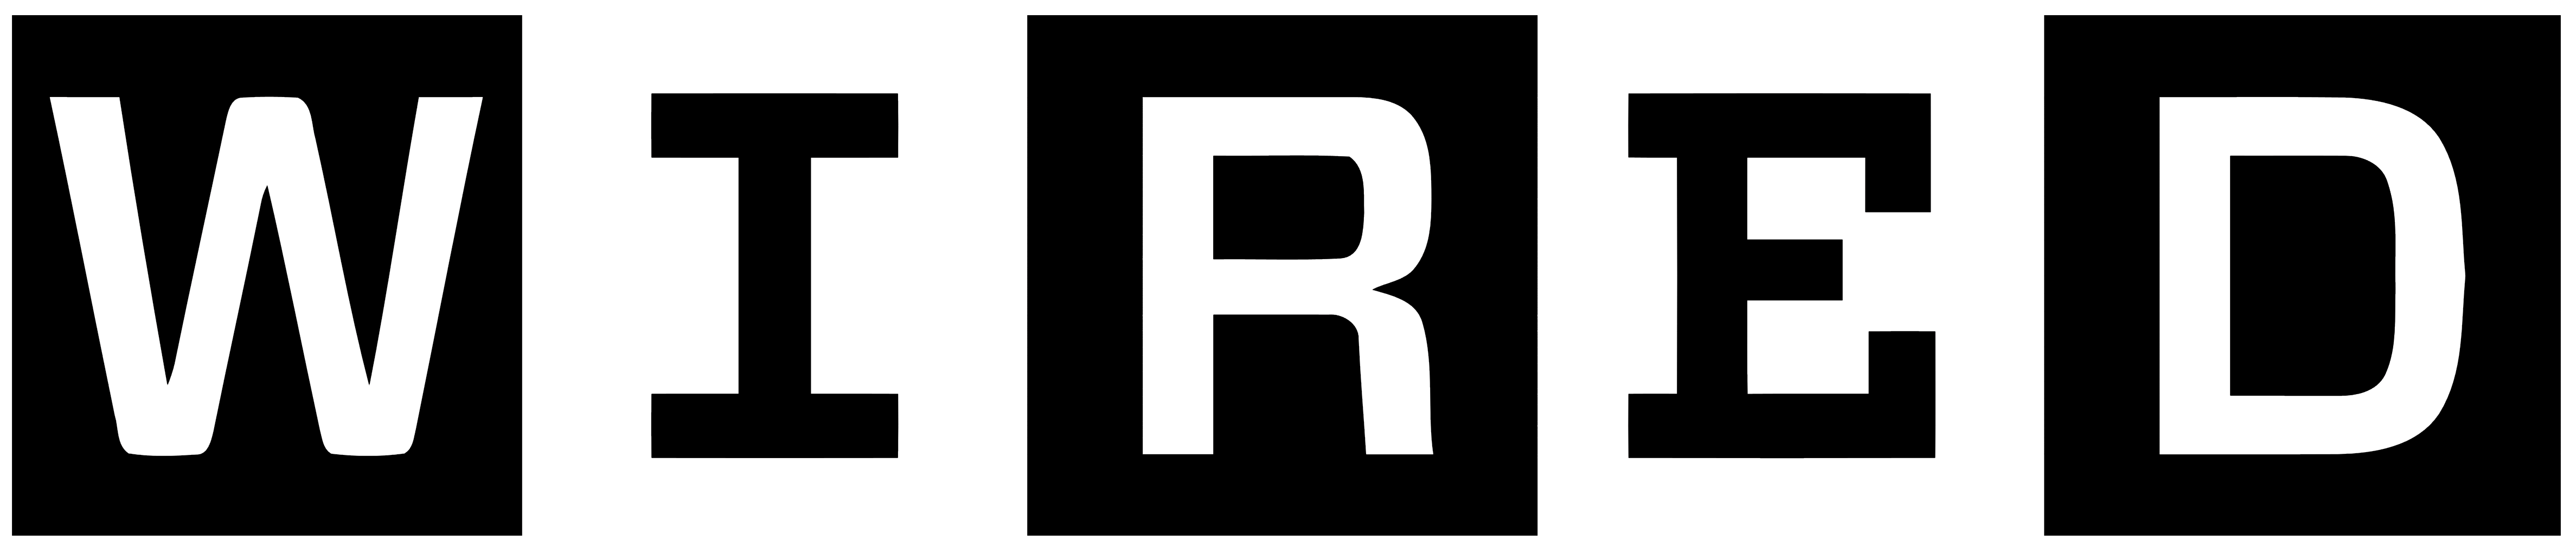 wired-logo - Infento